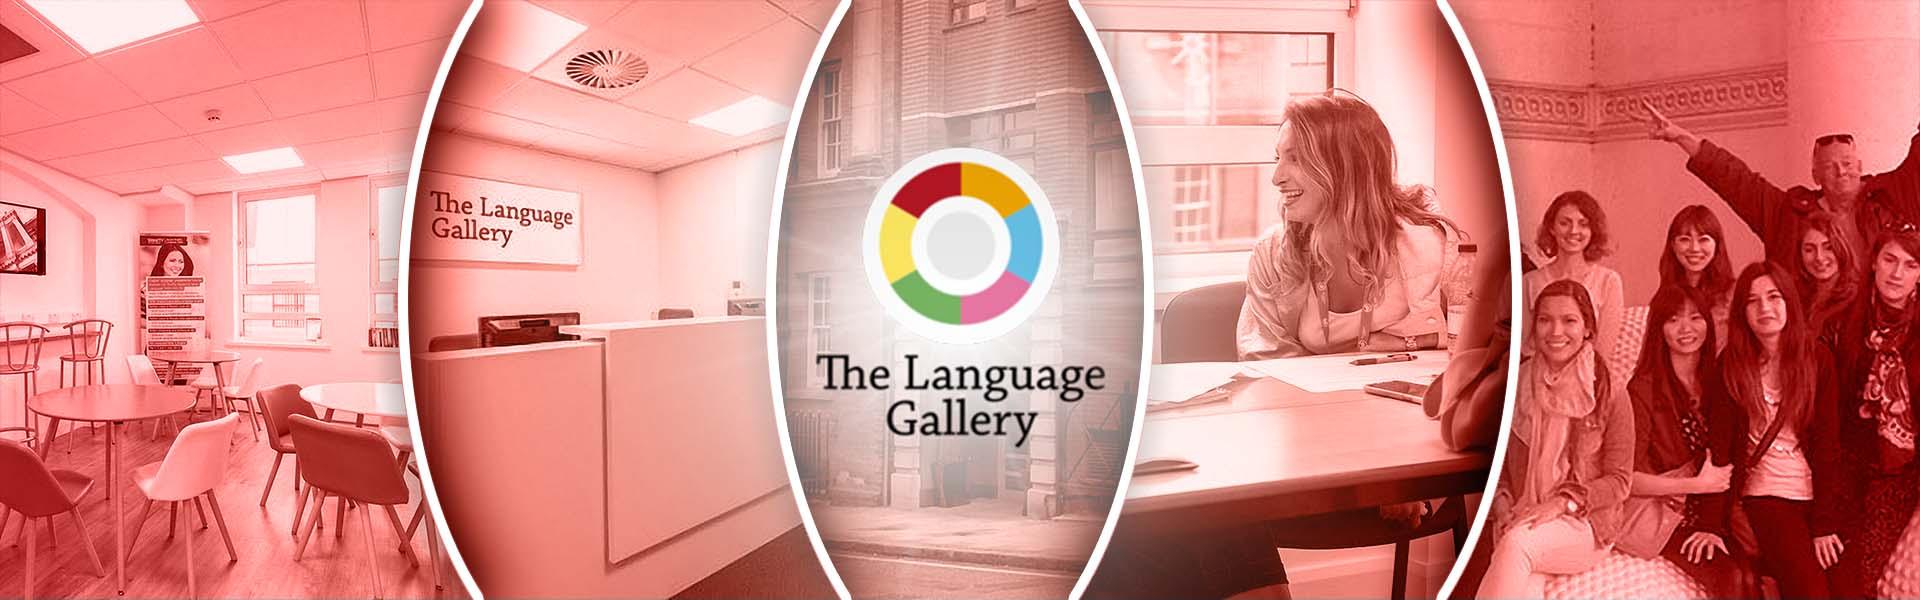 The Language Gallery Birmingham